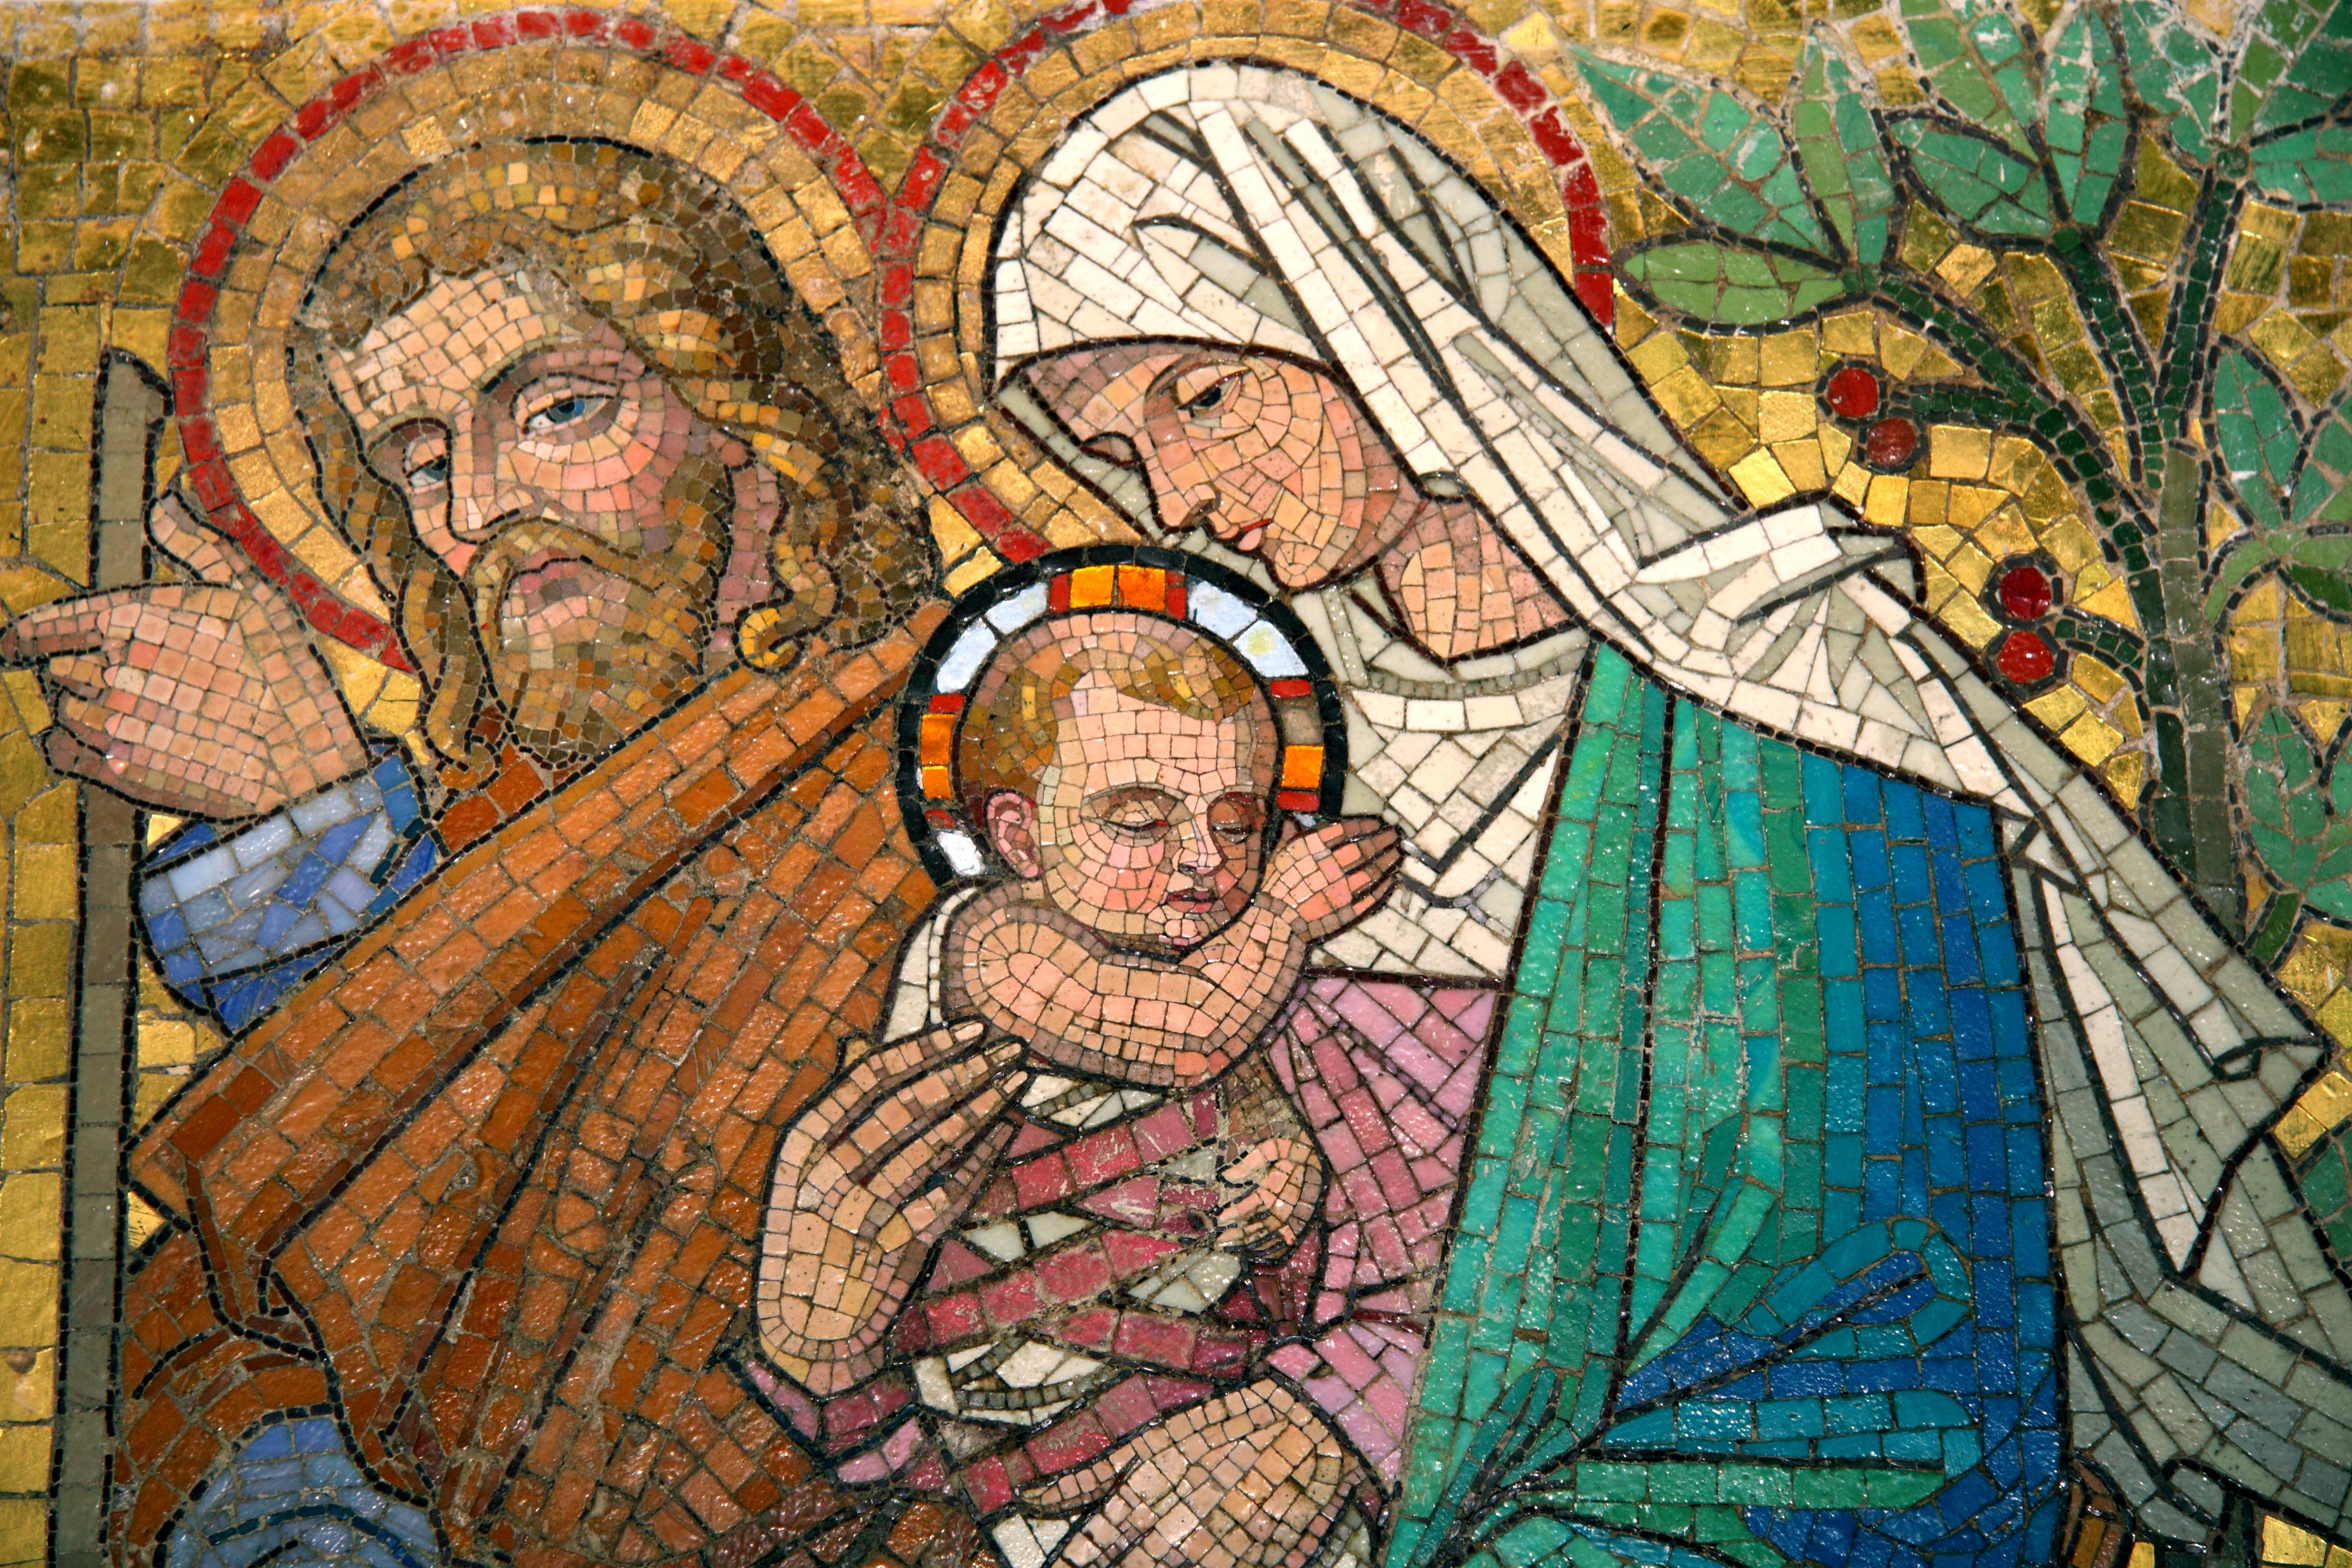 How Do We Experience Faith - Family Reflection Video